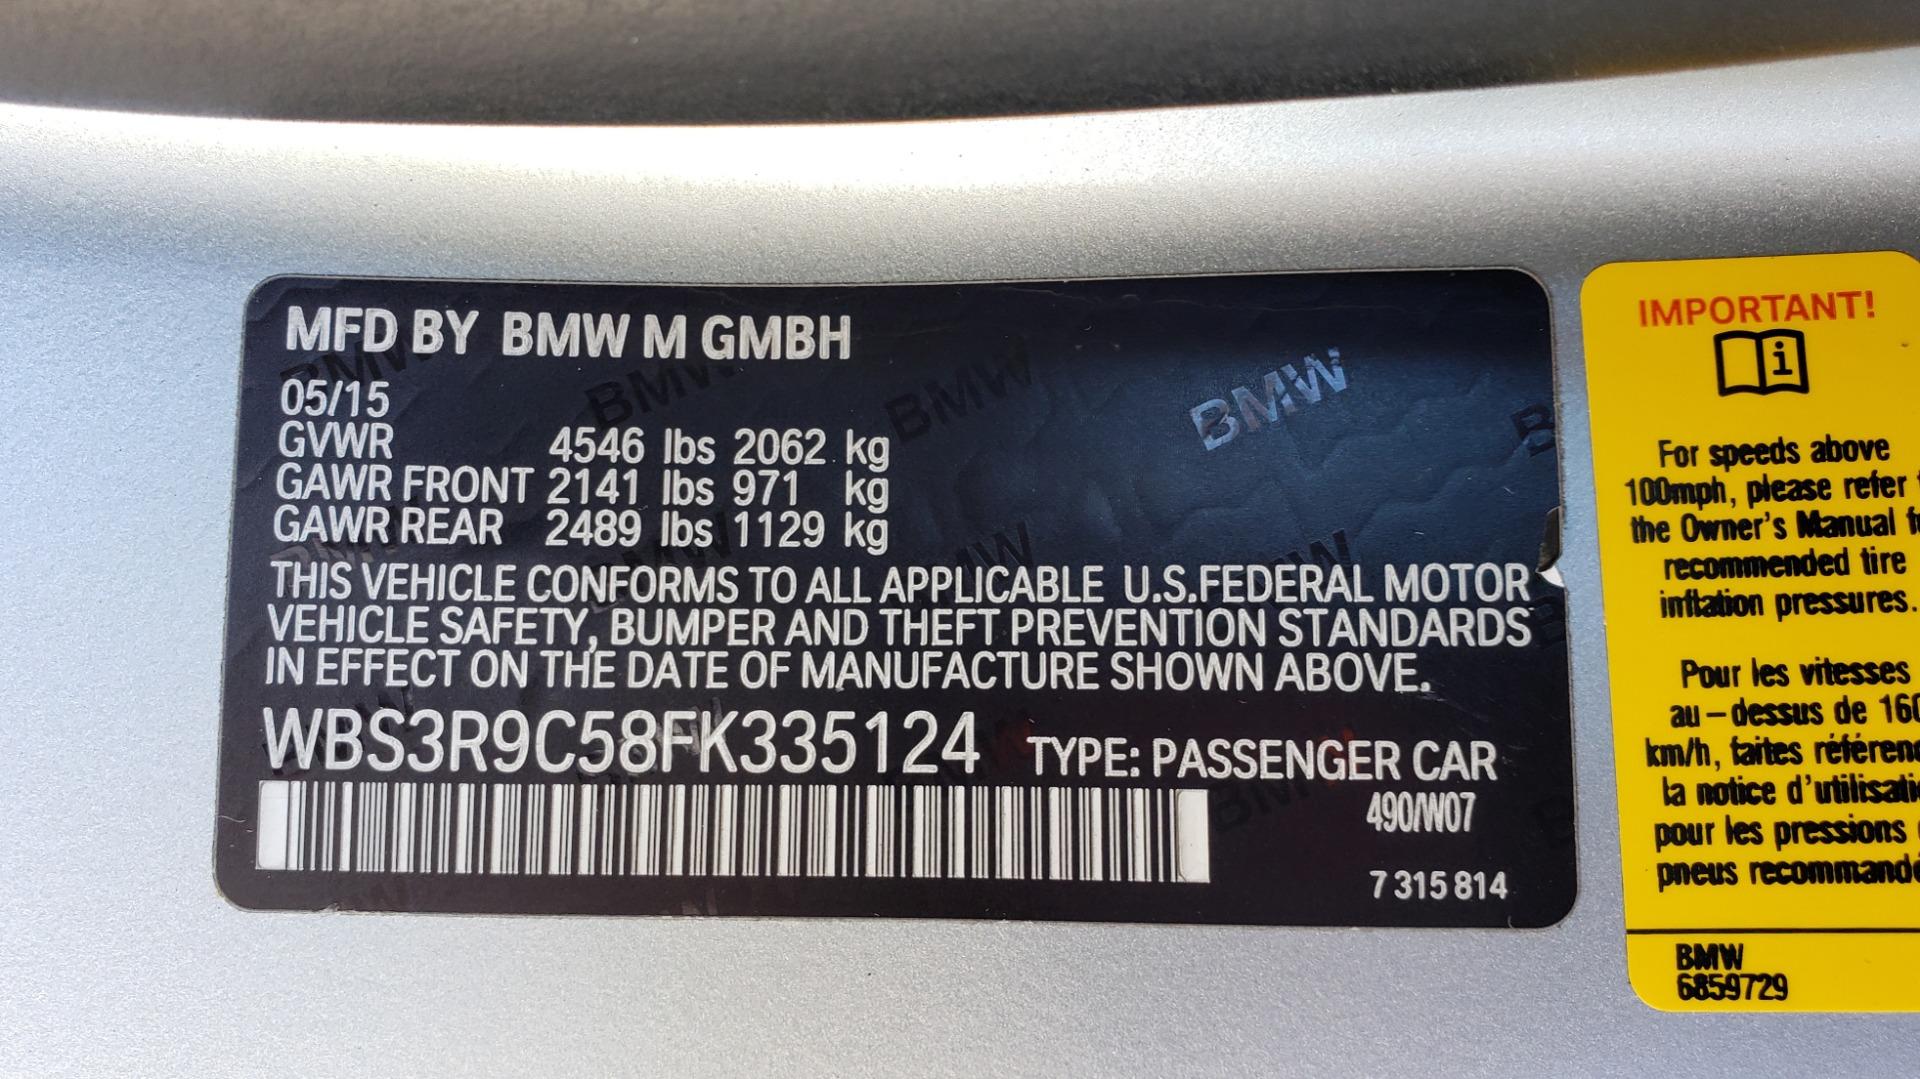 Used 2015 BMW M4 COUPE / EXEC PKG / DRVR ASST PLUS / LIGHTING / M-SUSPENSION for sale Sold at Formula Imports in Charlotte NC 28227 89